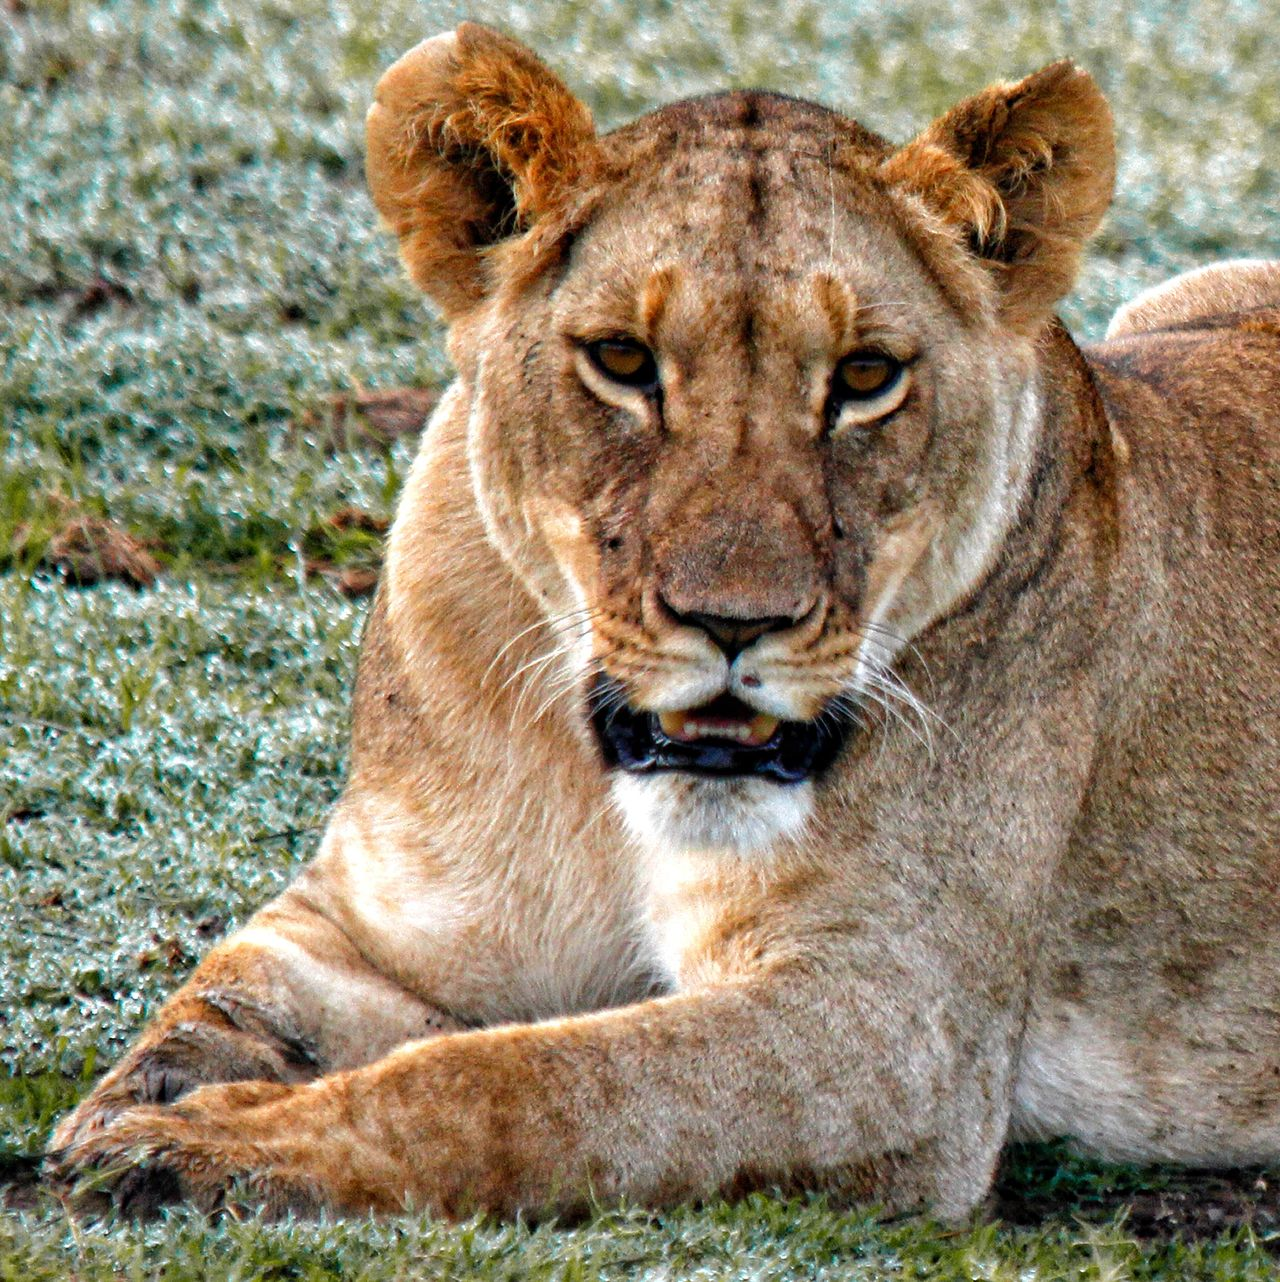 A resting Lioness after a sucessful hunt Full Lioness Lion Topofthefoodchain Kingofthejungle Bigcat Bigcatphotography Bigfive